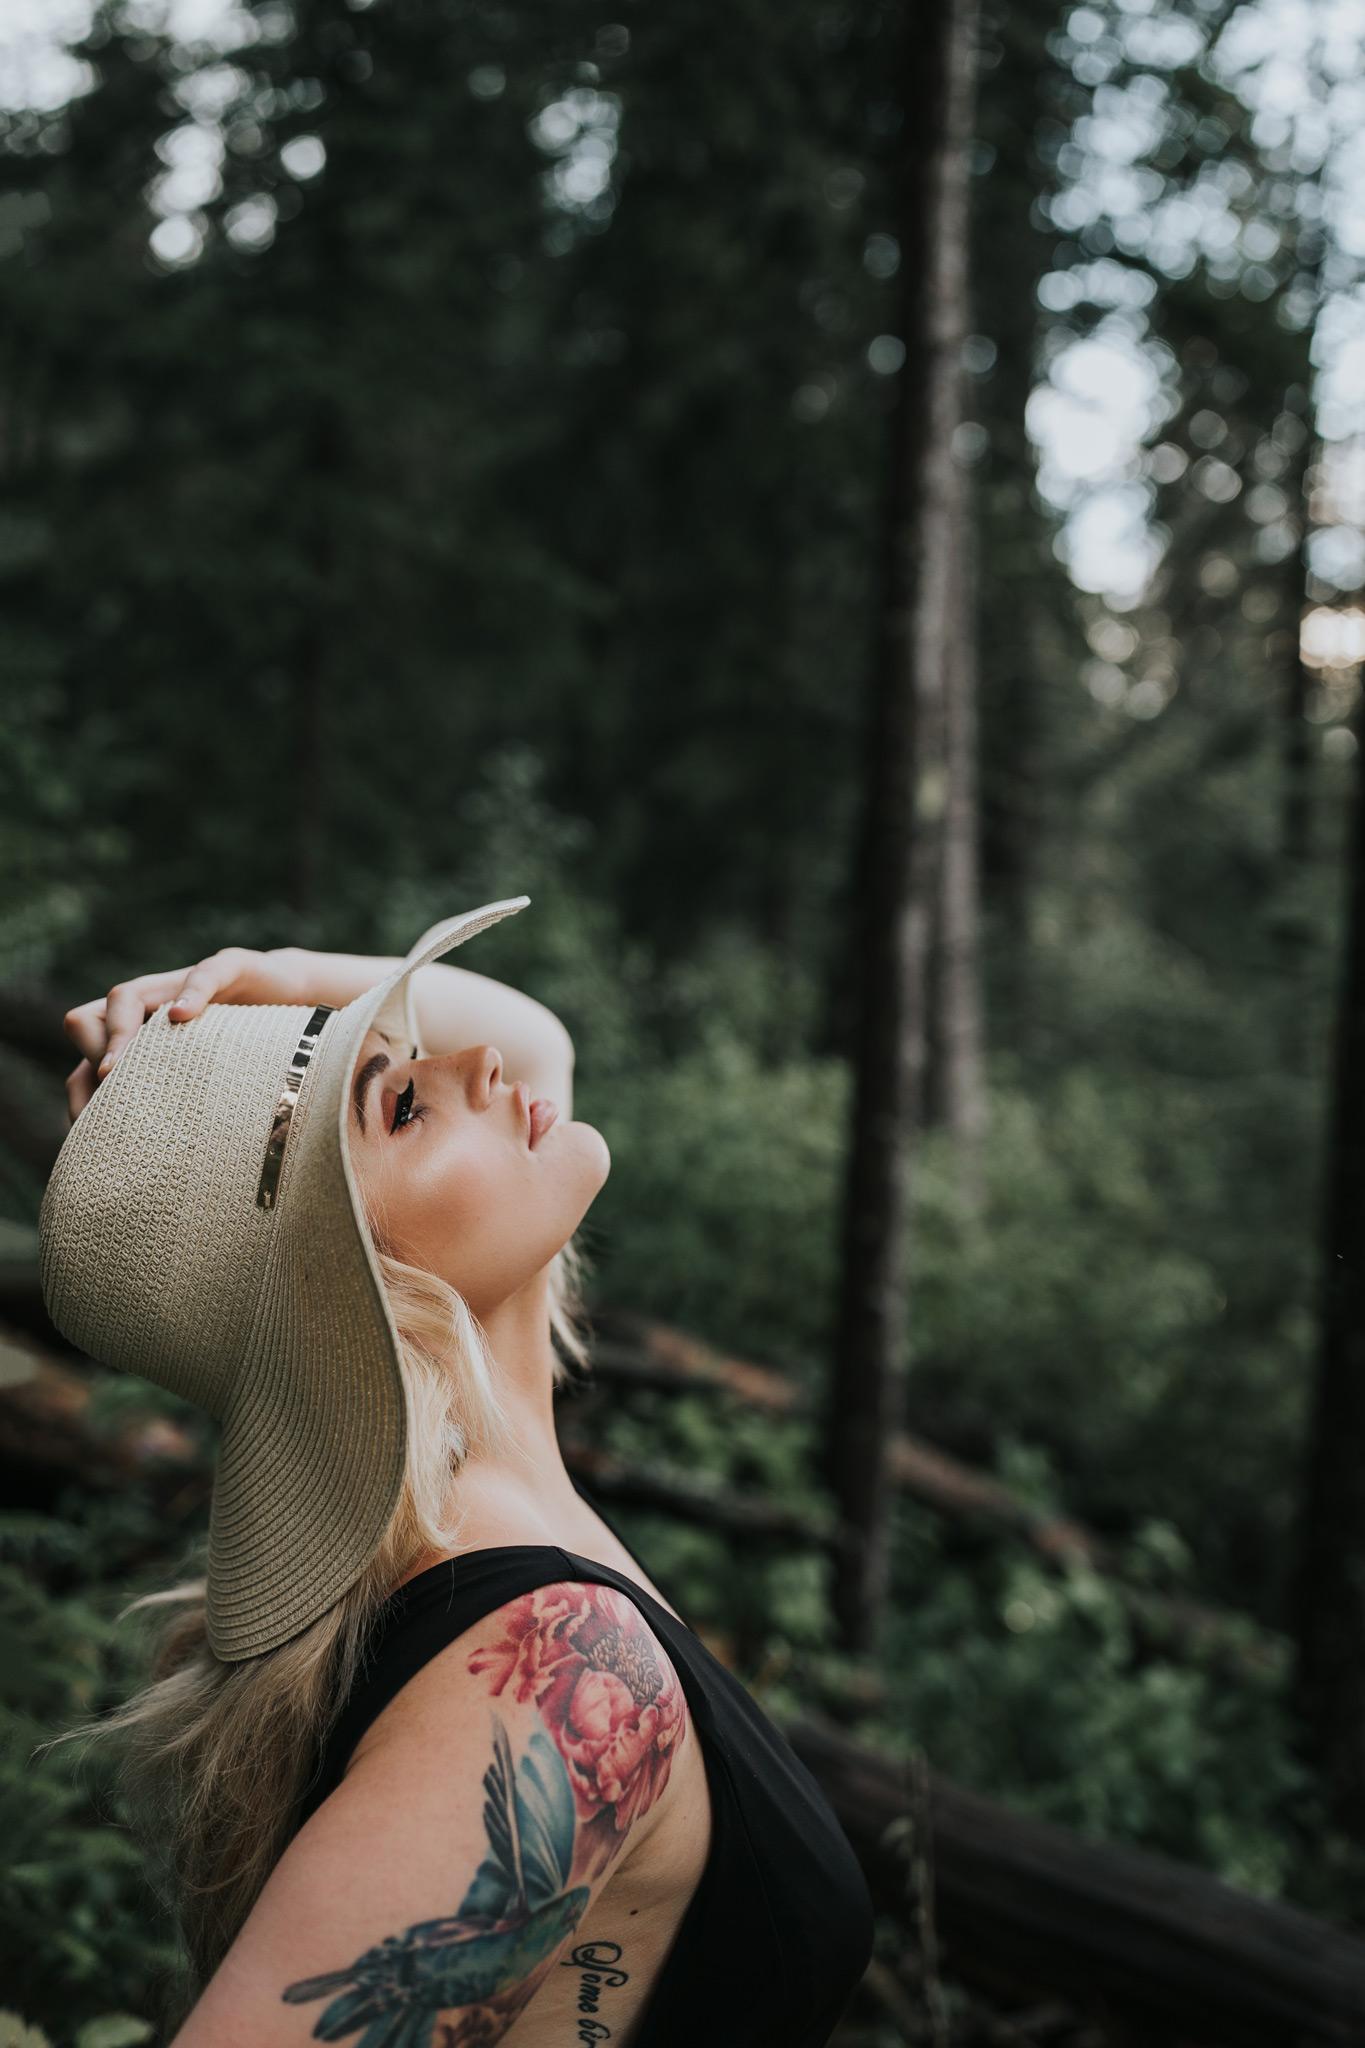 woman leans back holding hat on head reesor lake alberta